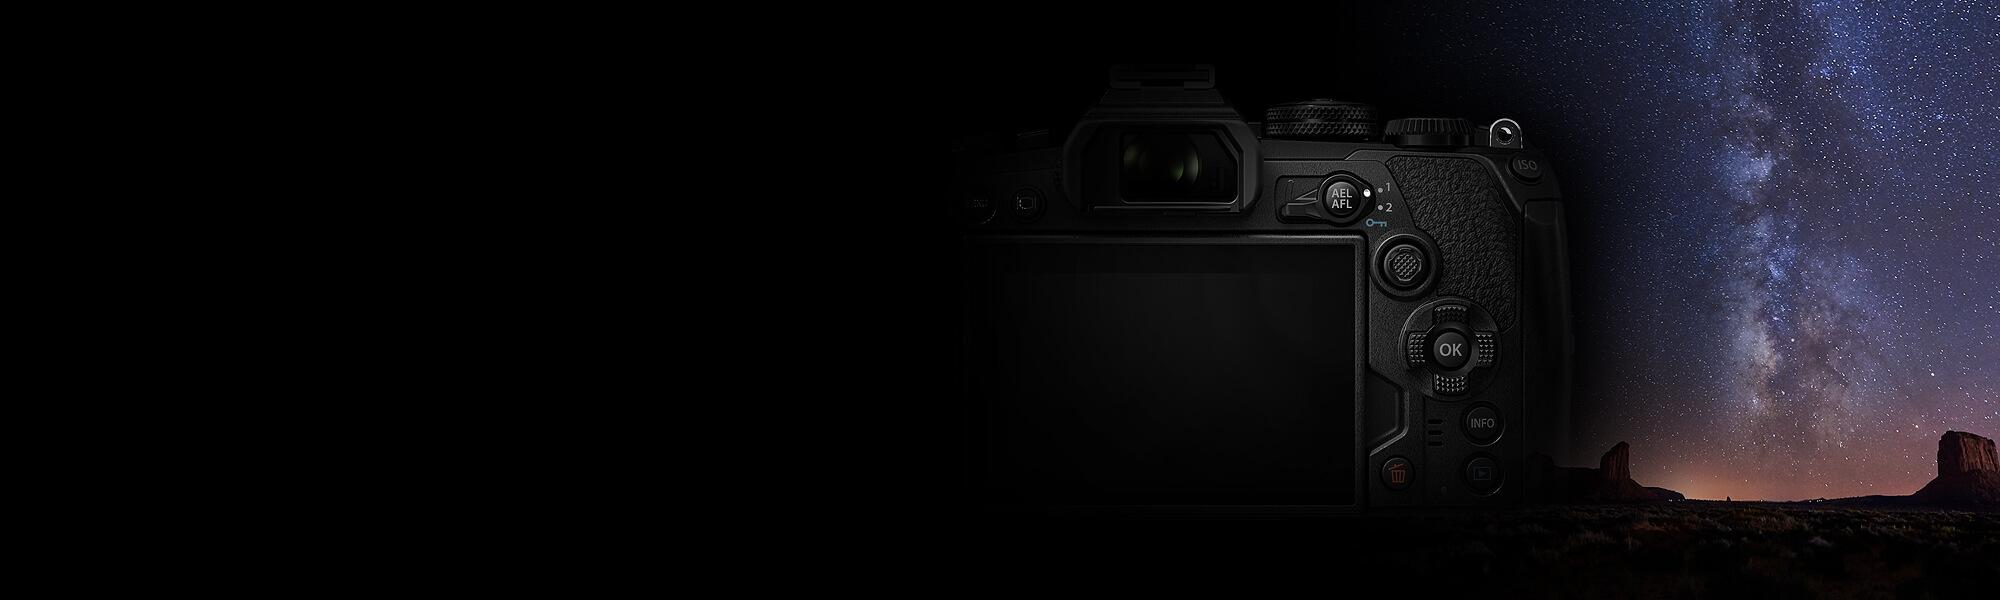 Olympus OM D E M1 Mark III Mirrorless Digital Camera 11